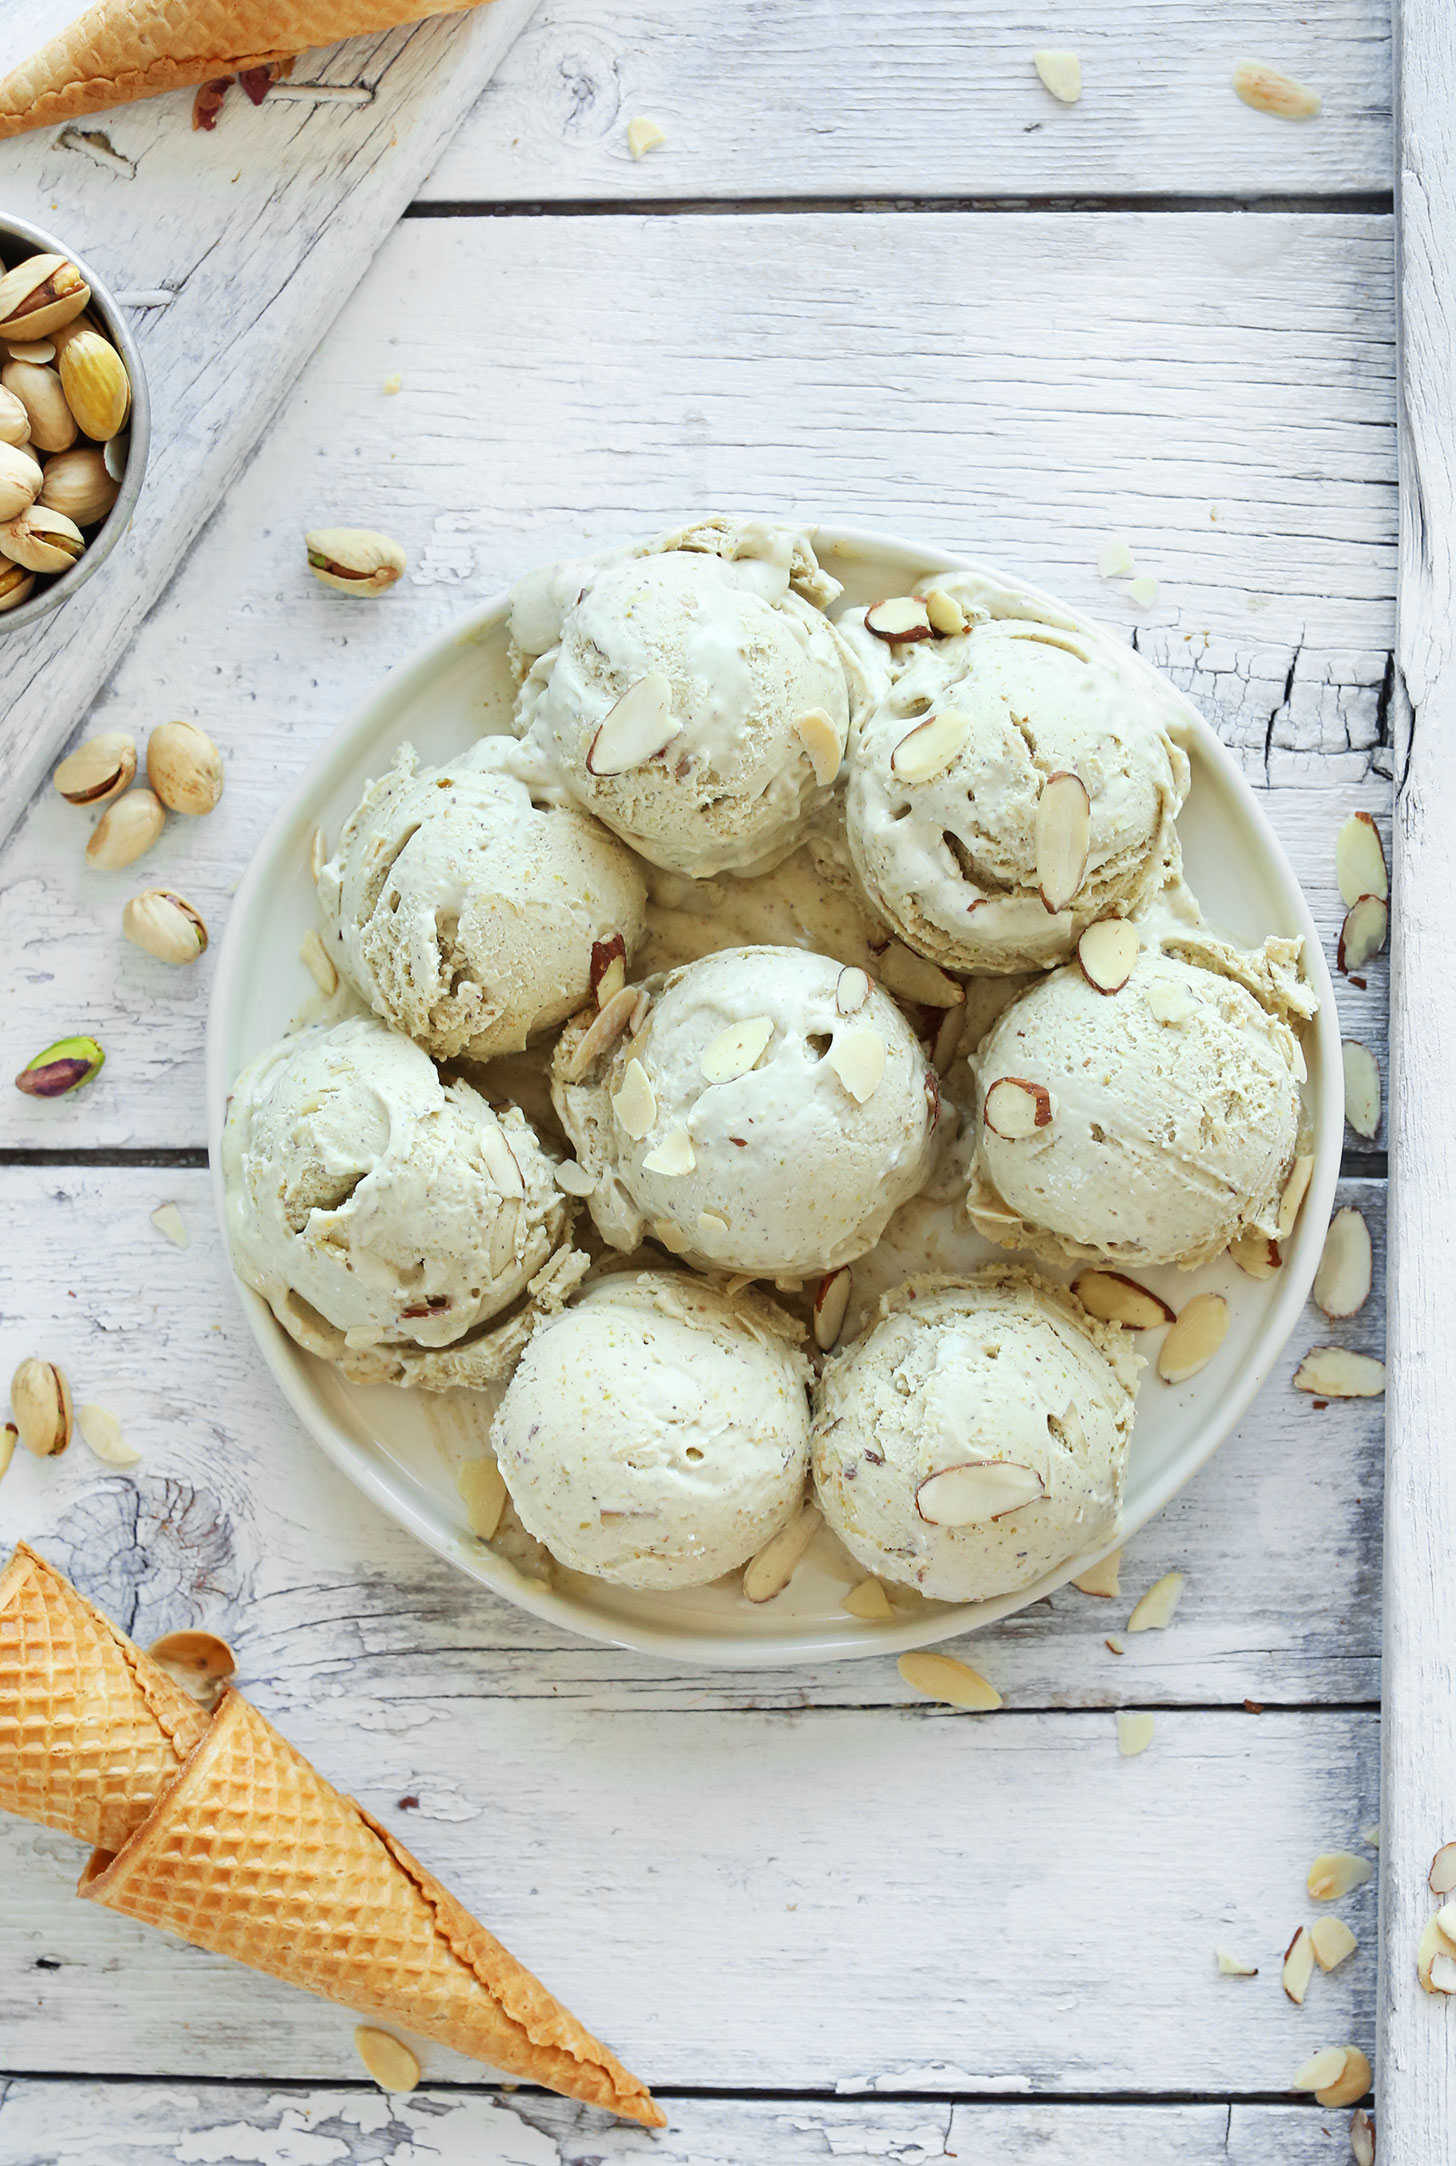 VEGAN PISTACHIO and ALMOND Ice Cream! So rich and creamy, perfectly sweet, and so delicious! #vegan #icecream #recipe #pistachio #almond #dessert #minimalistbaker